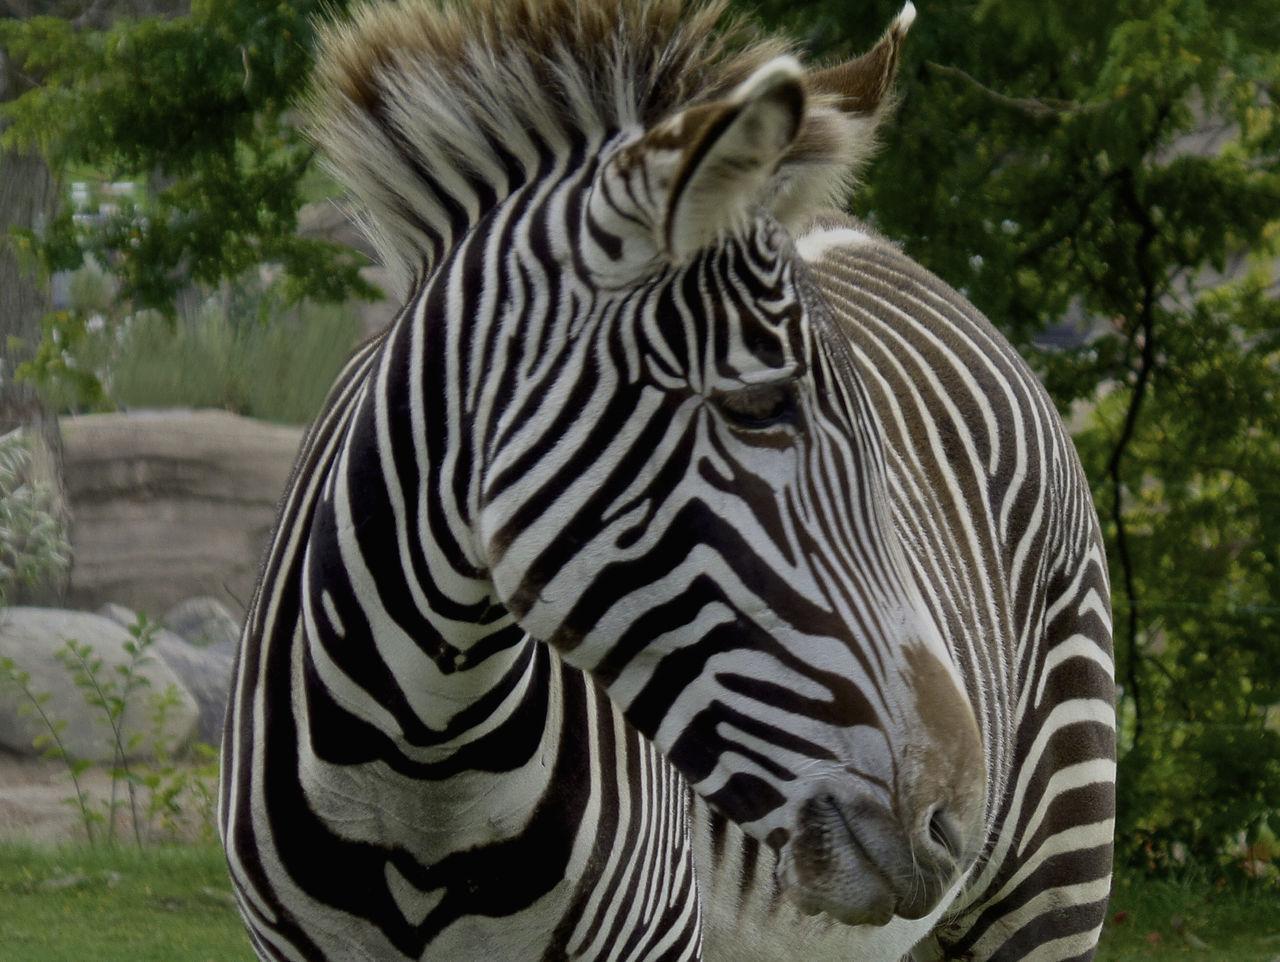 animals in the wild, striped, one animal, animal themes, animal wildlife, zebra, day, outdoors, nature, focus on foreground, animal markings, no people, mammal, safari animals, close-up, tree